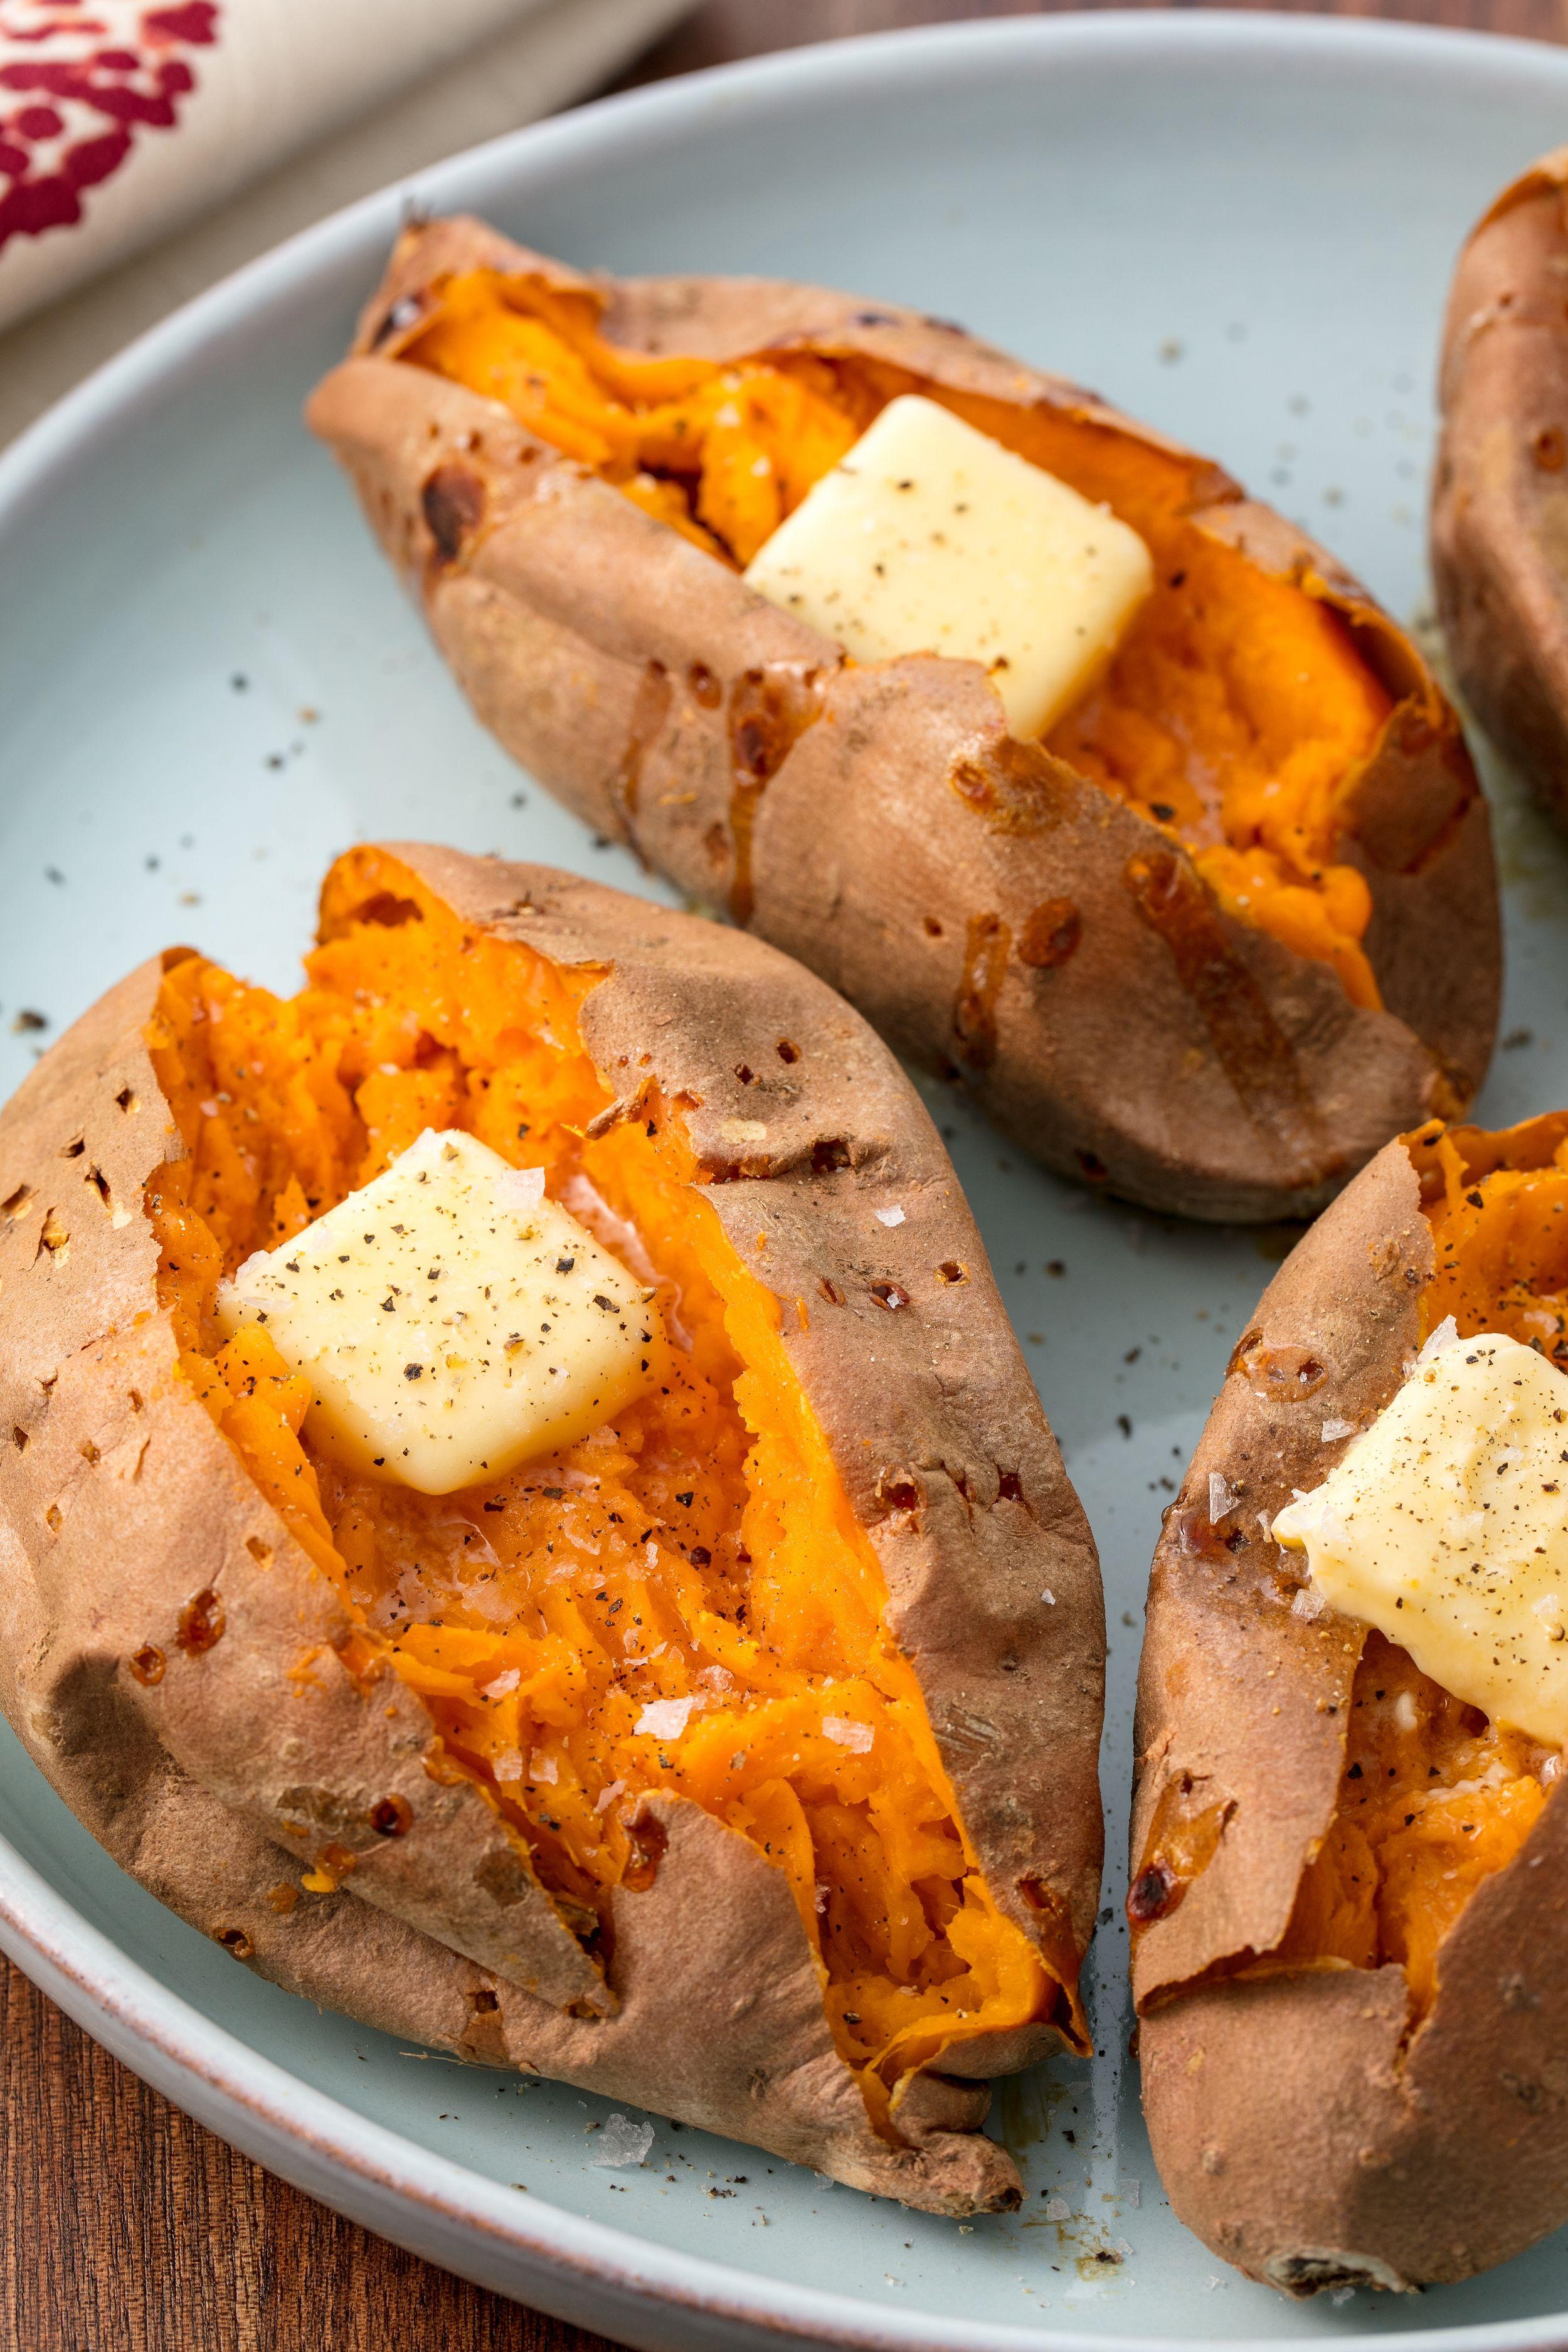 Ways to eat sweet potatoes